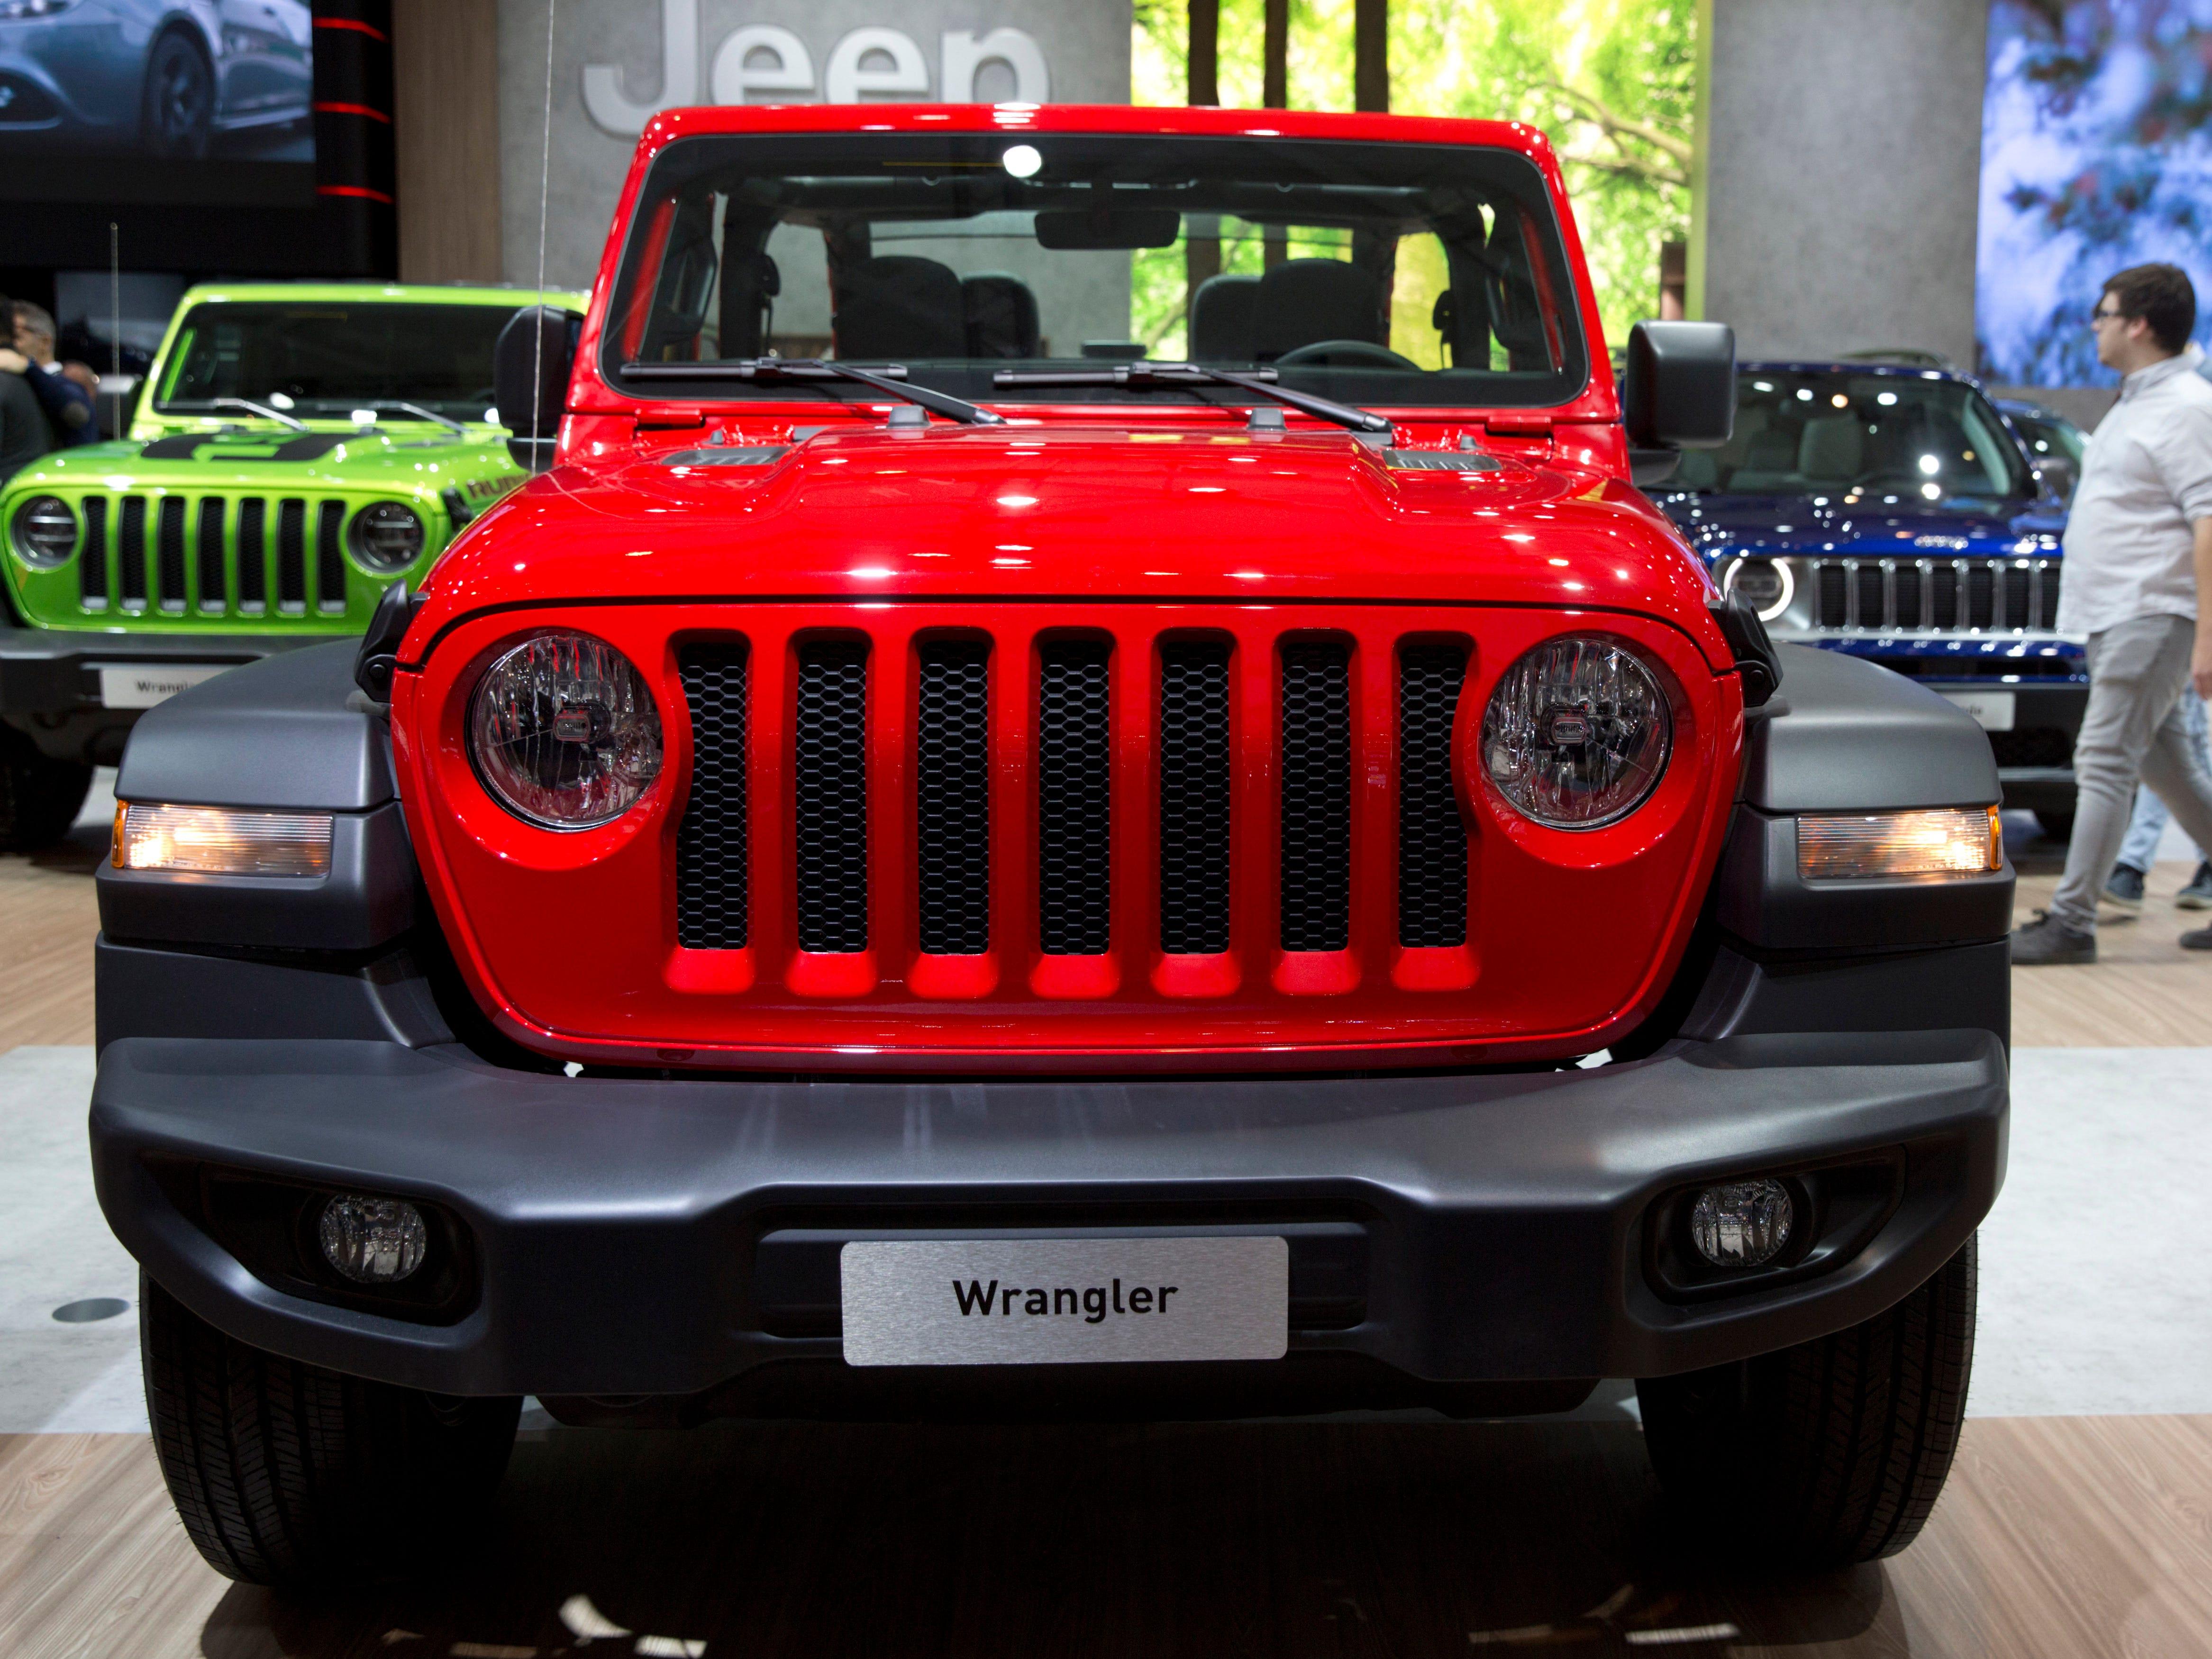 The new Jeep Wrangler.